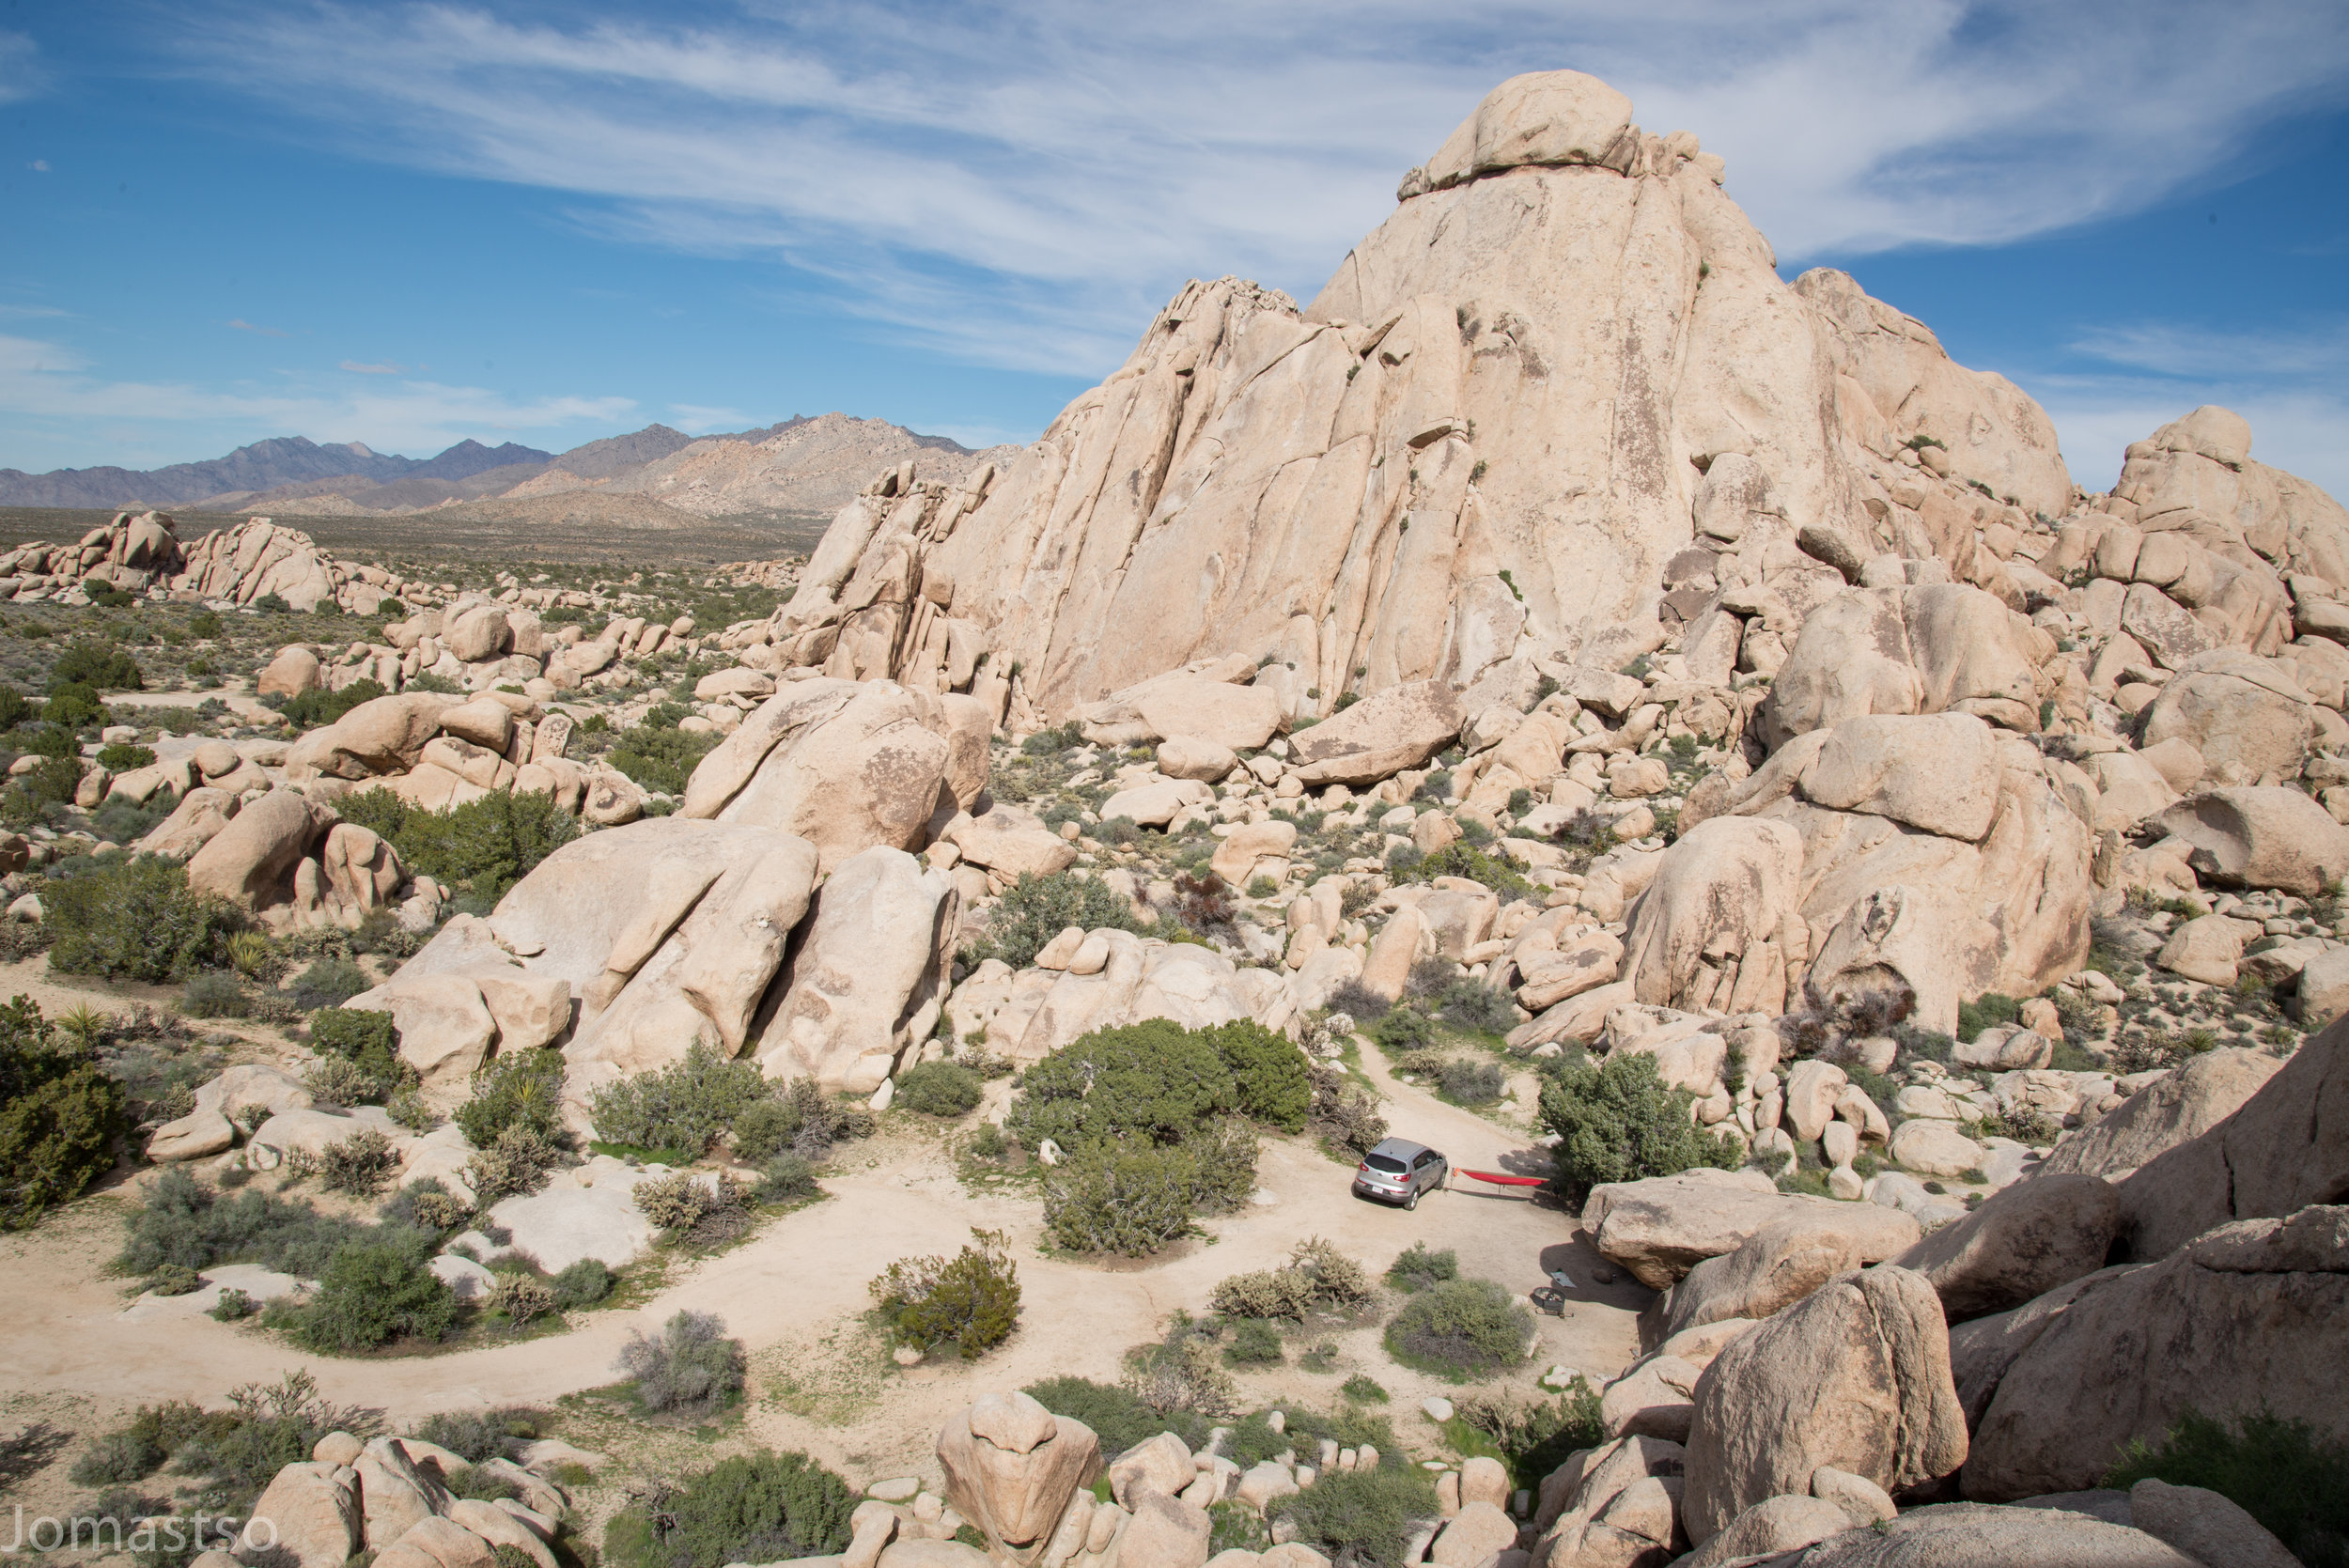 Desert Camp in the Granite Mountains